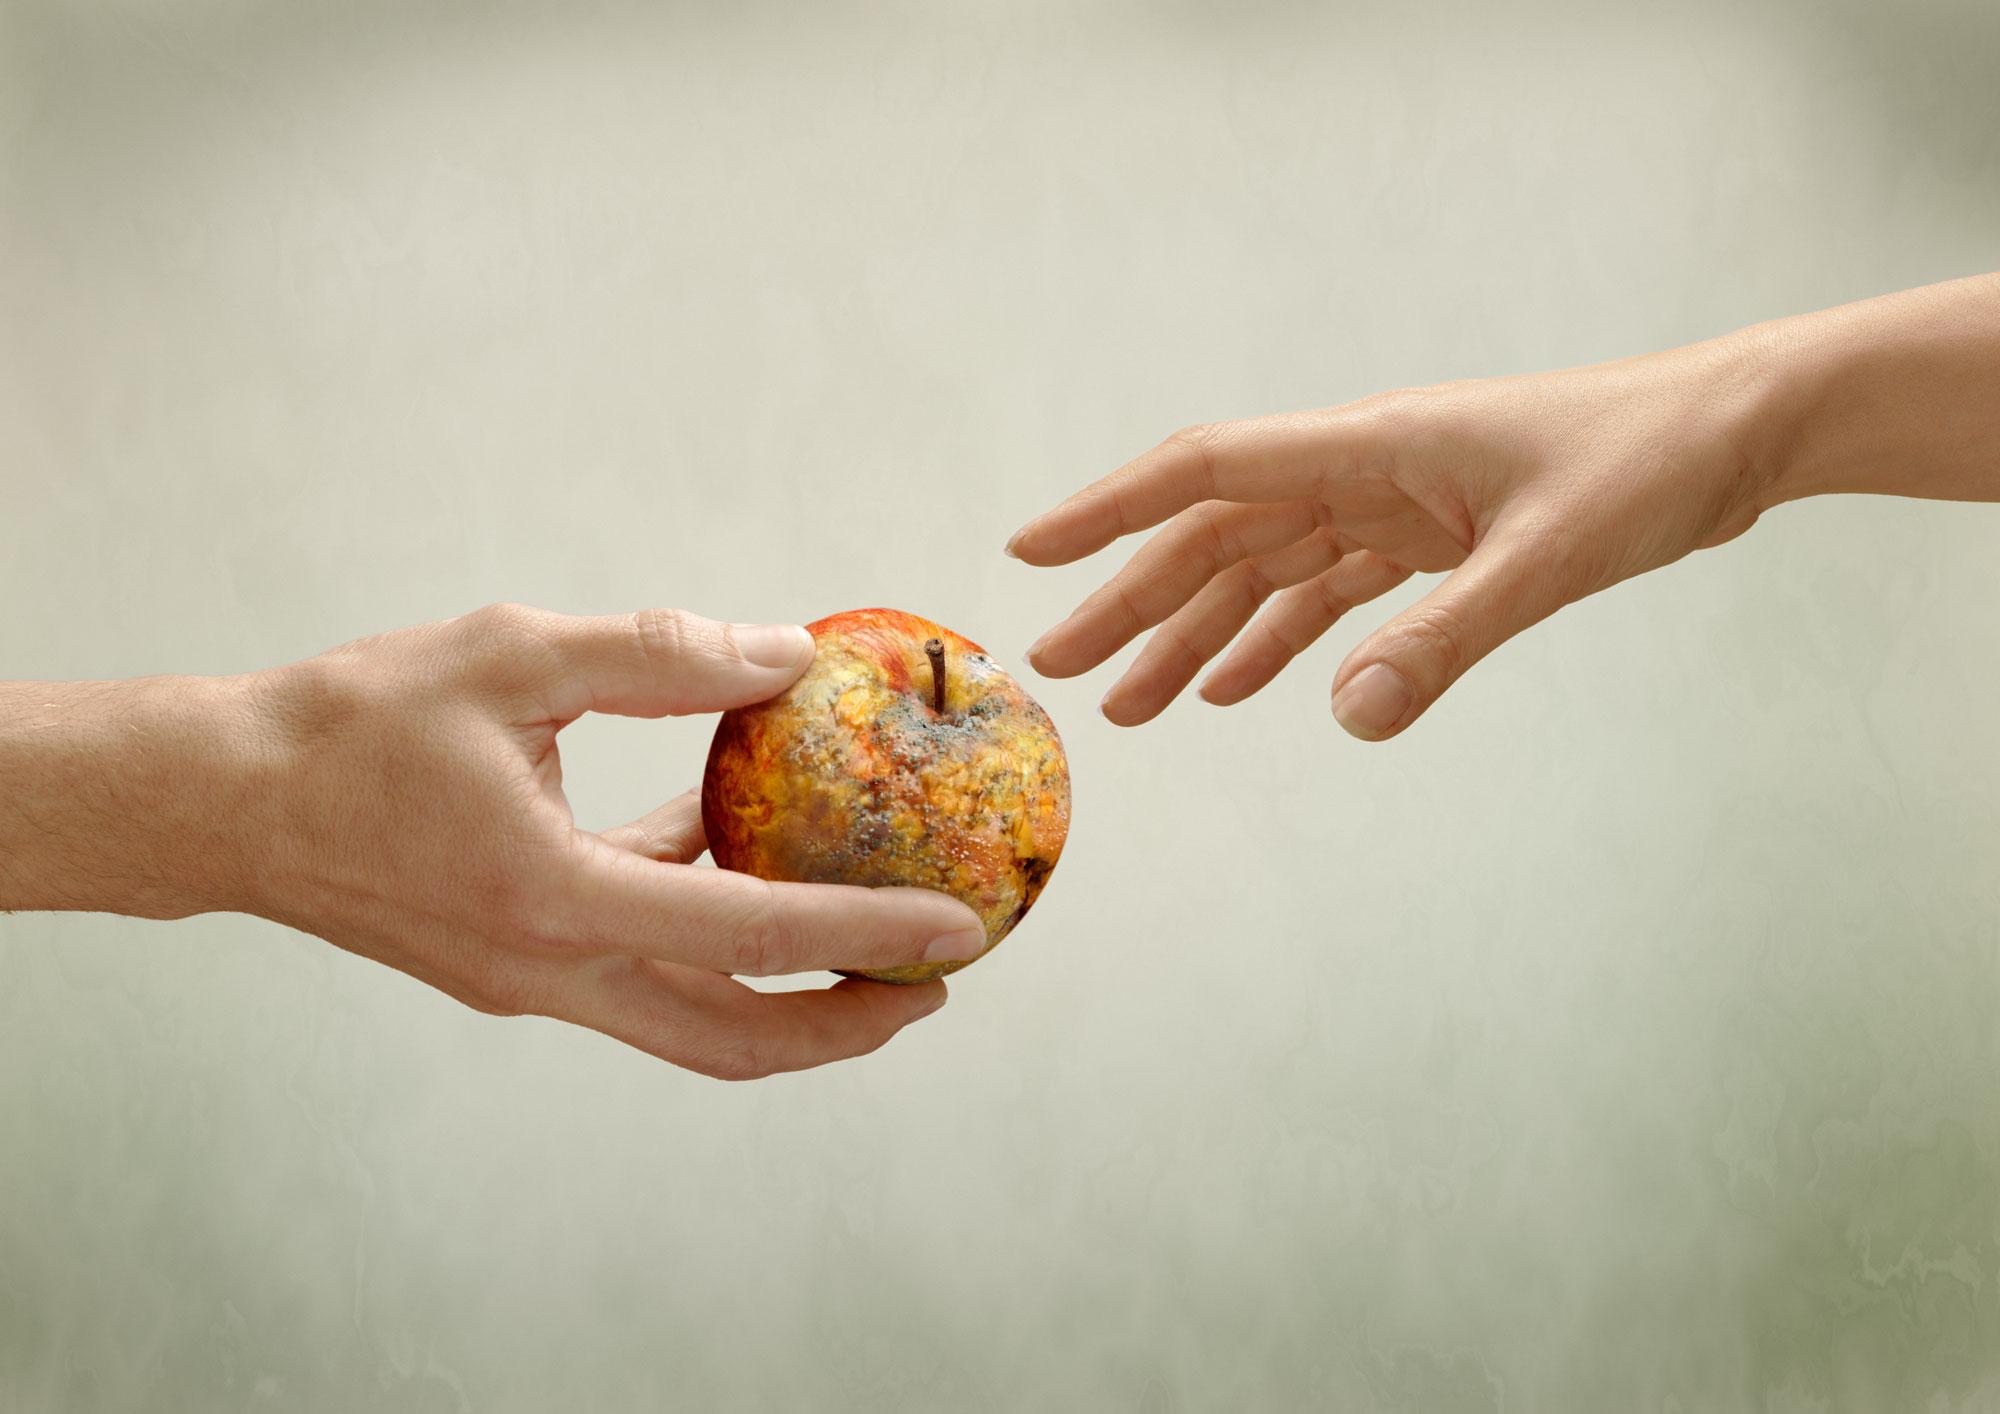 Hands; rotten; apple; michelangelo; sistine; chapel; aids; foundation; studio; amsterdam; the netherlands; handen; verotte; appel; sixtijnse kapel; aids fonds